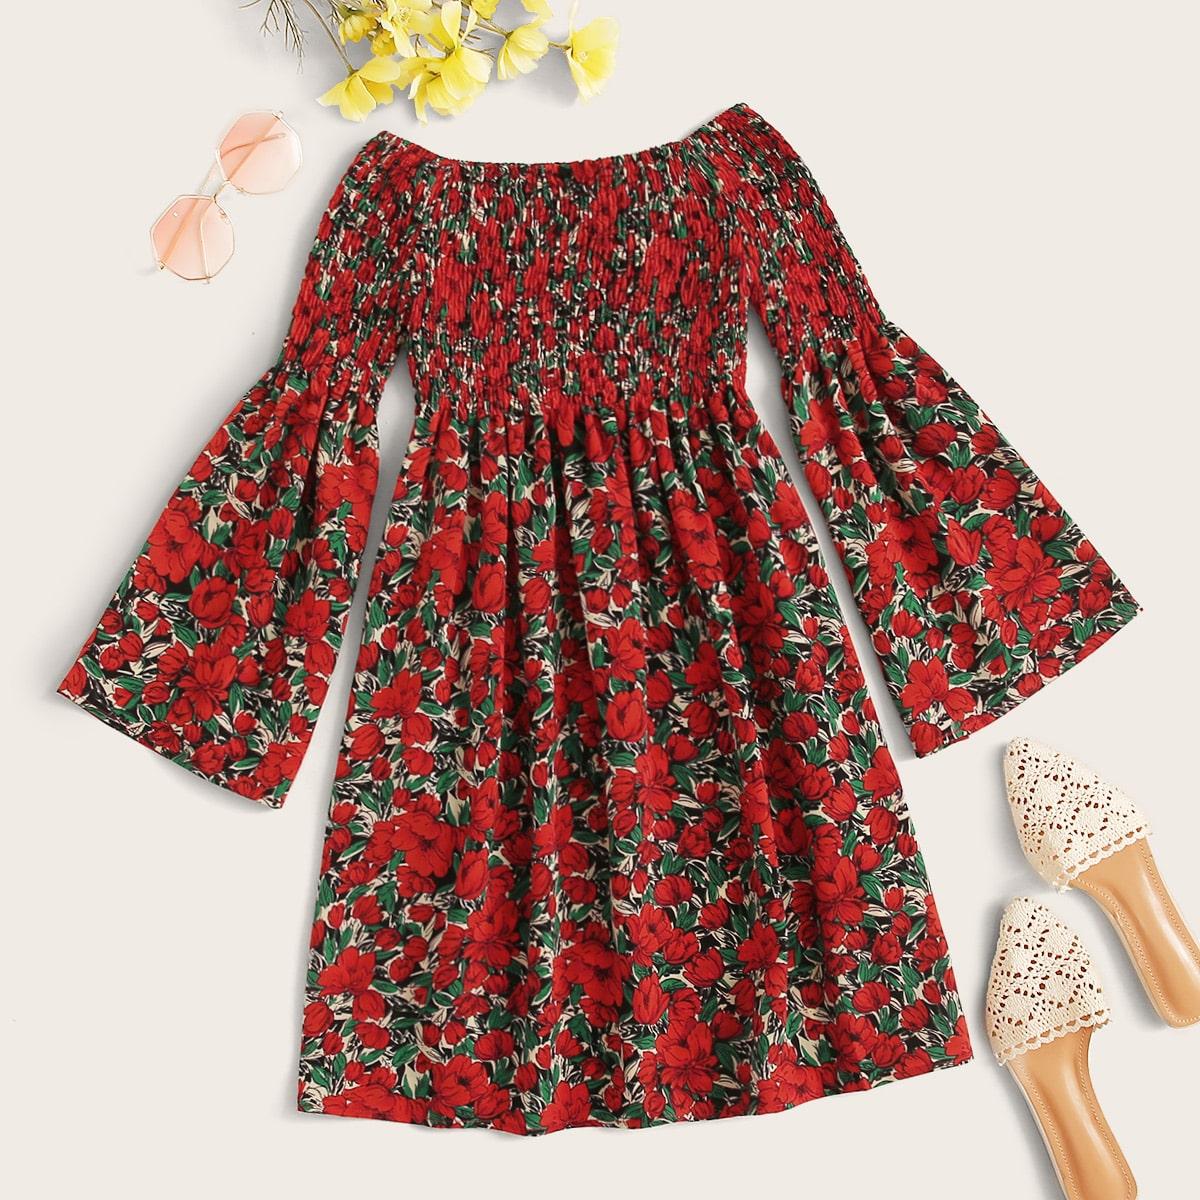 SHEIN / Bardot Shirred Flounce Sleeve Floral Dress